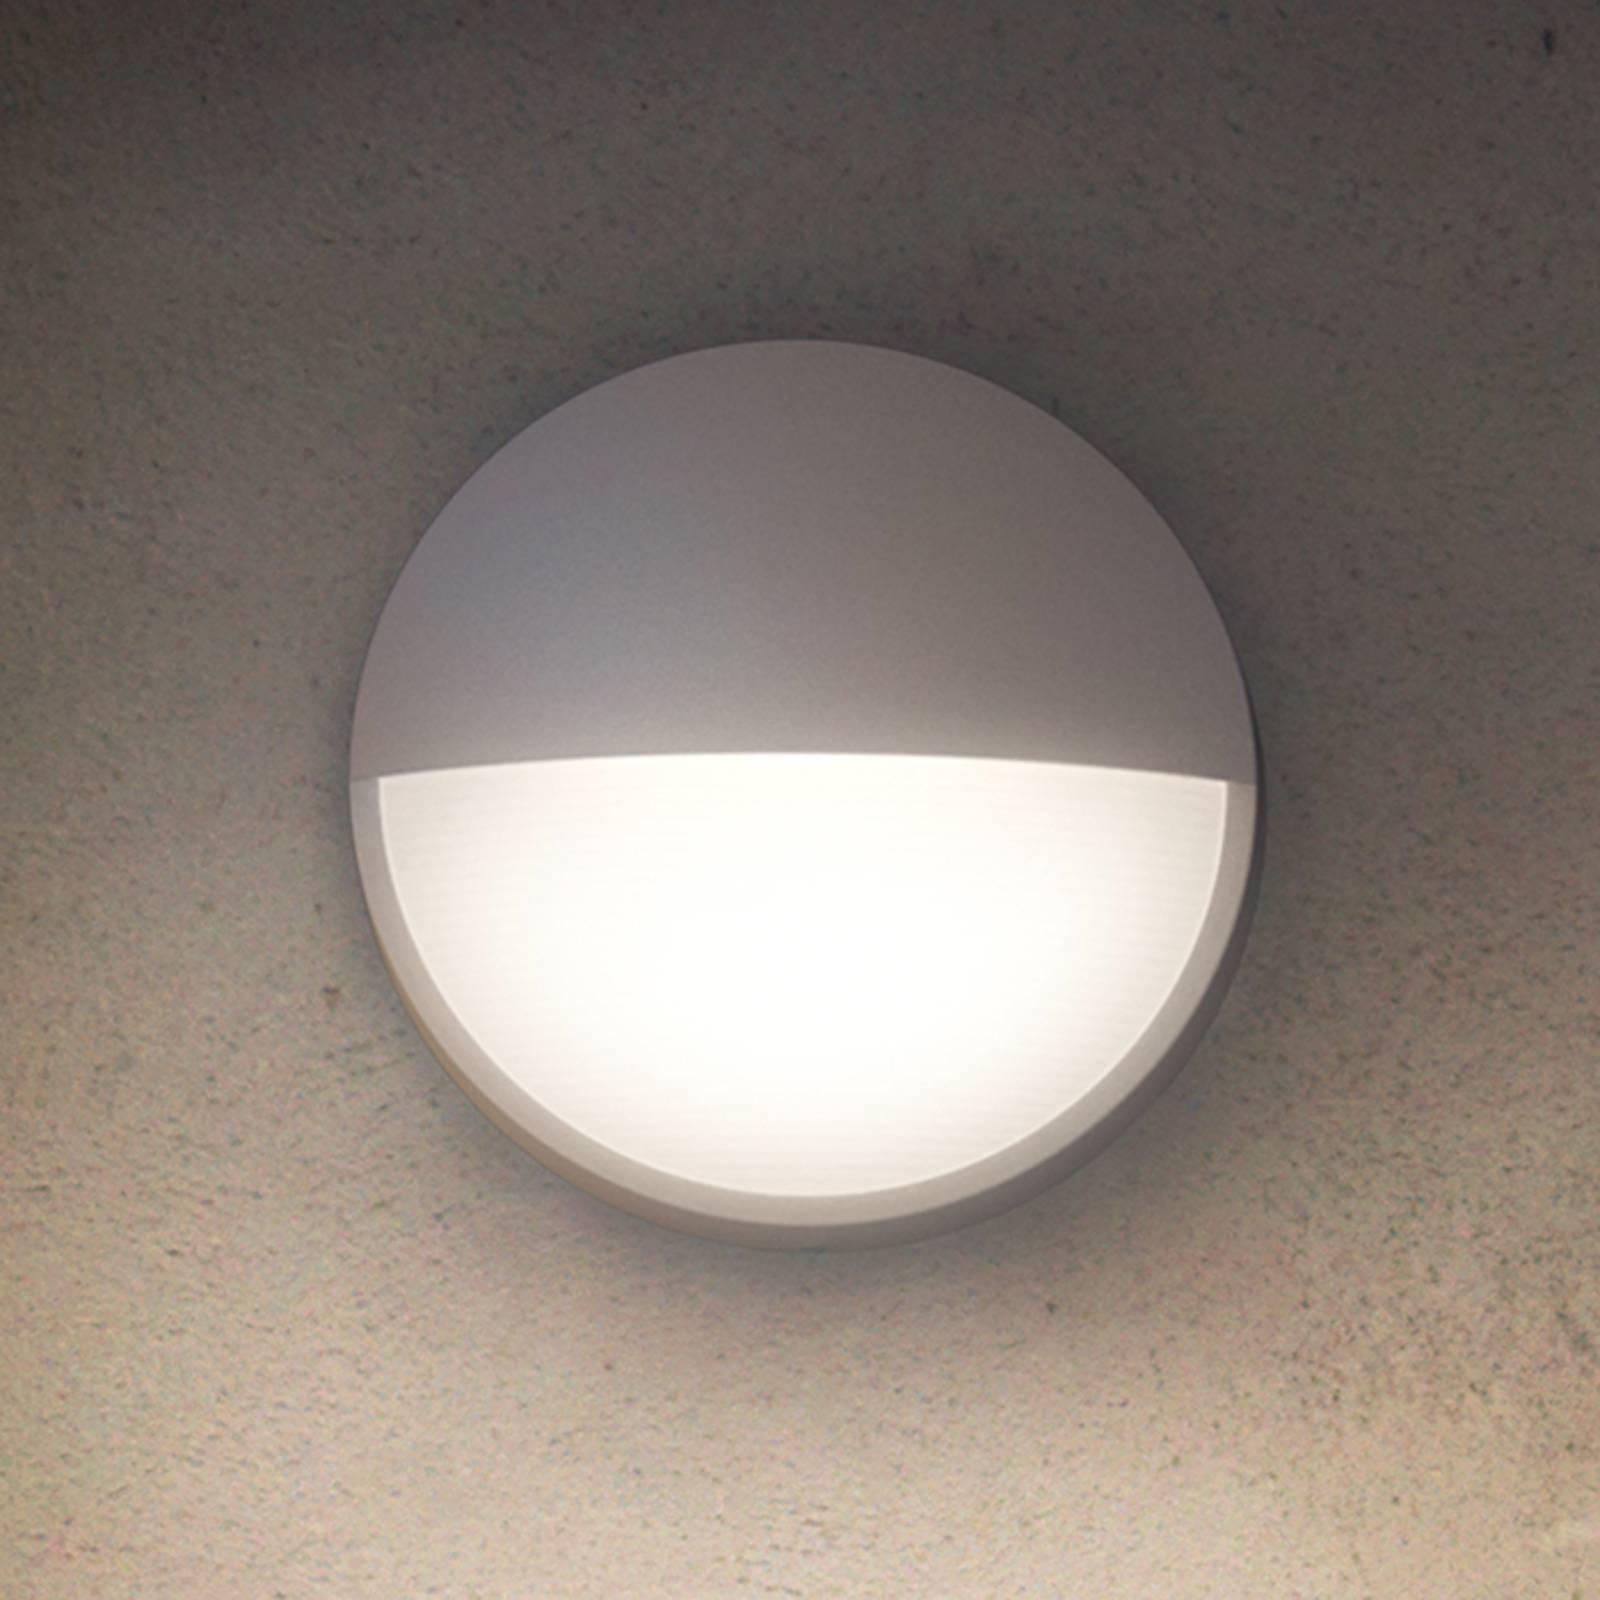 Philips Capricorn LED-Außenwandleuchte grau